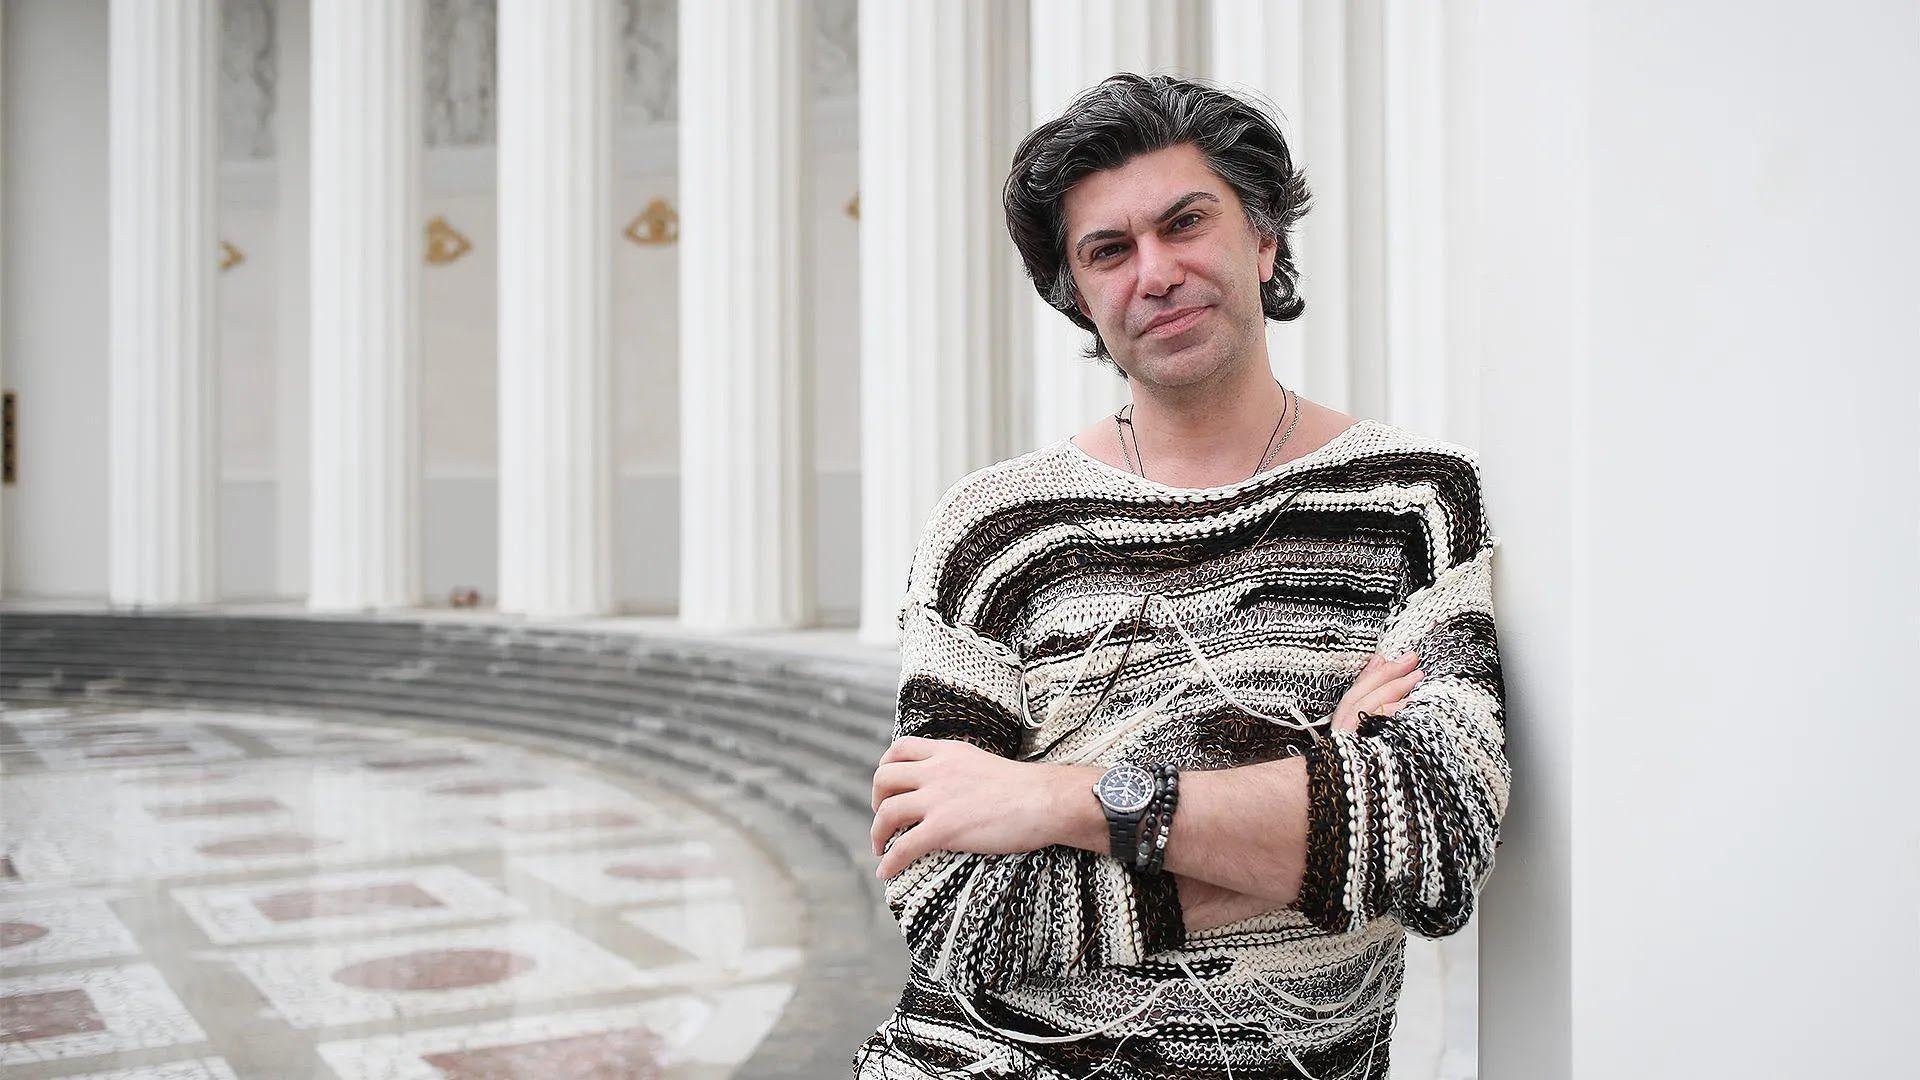 Николай Цискаридзе - интерсекс-человек